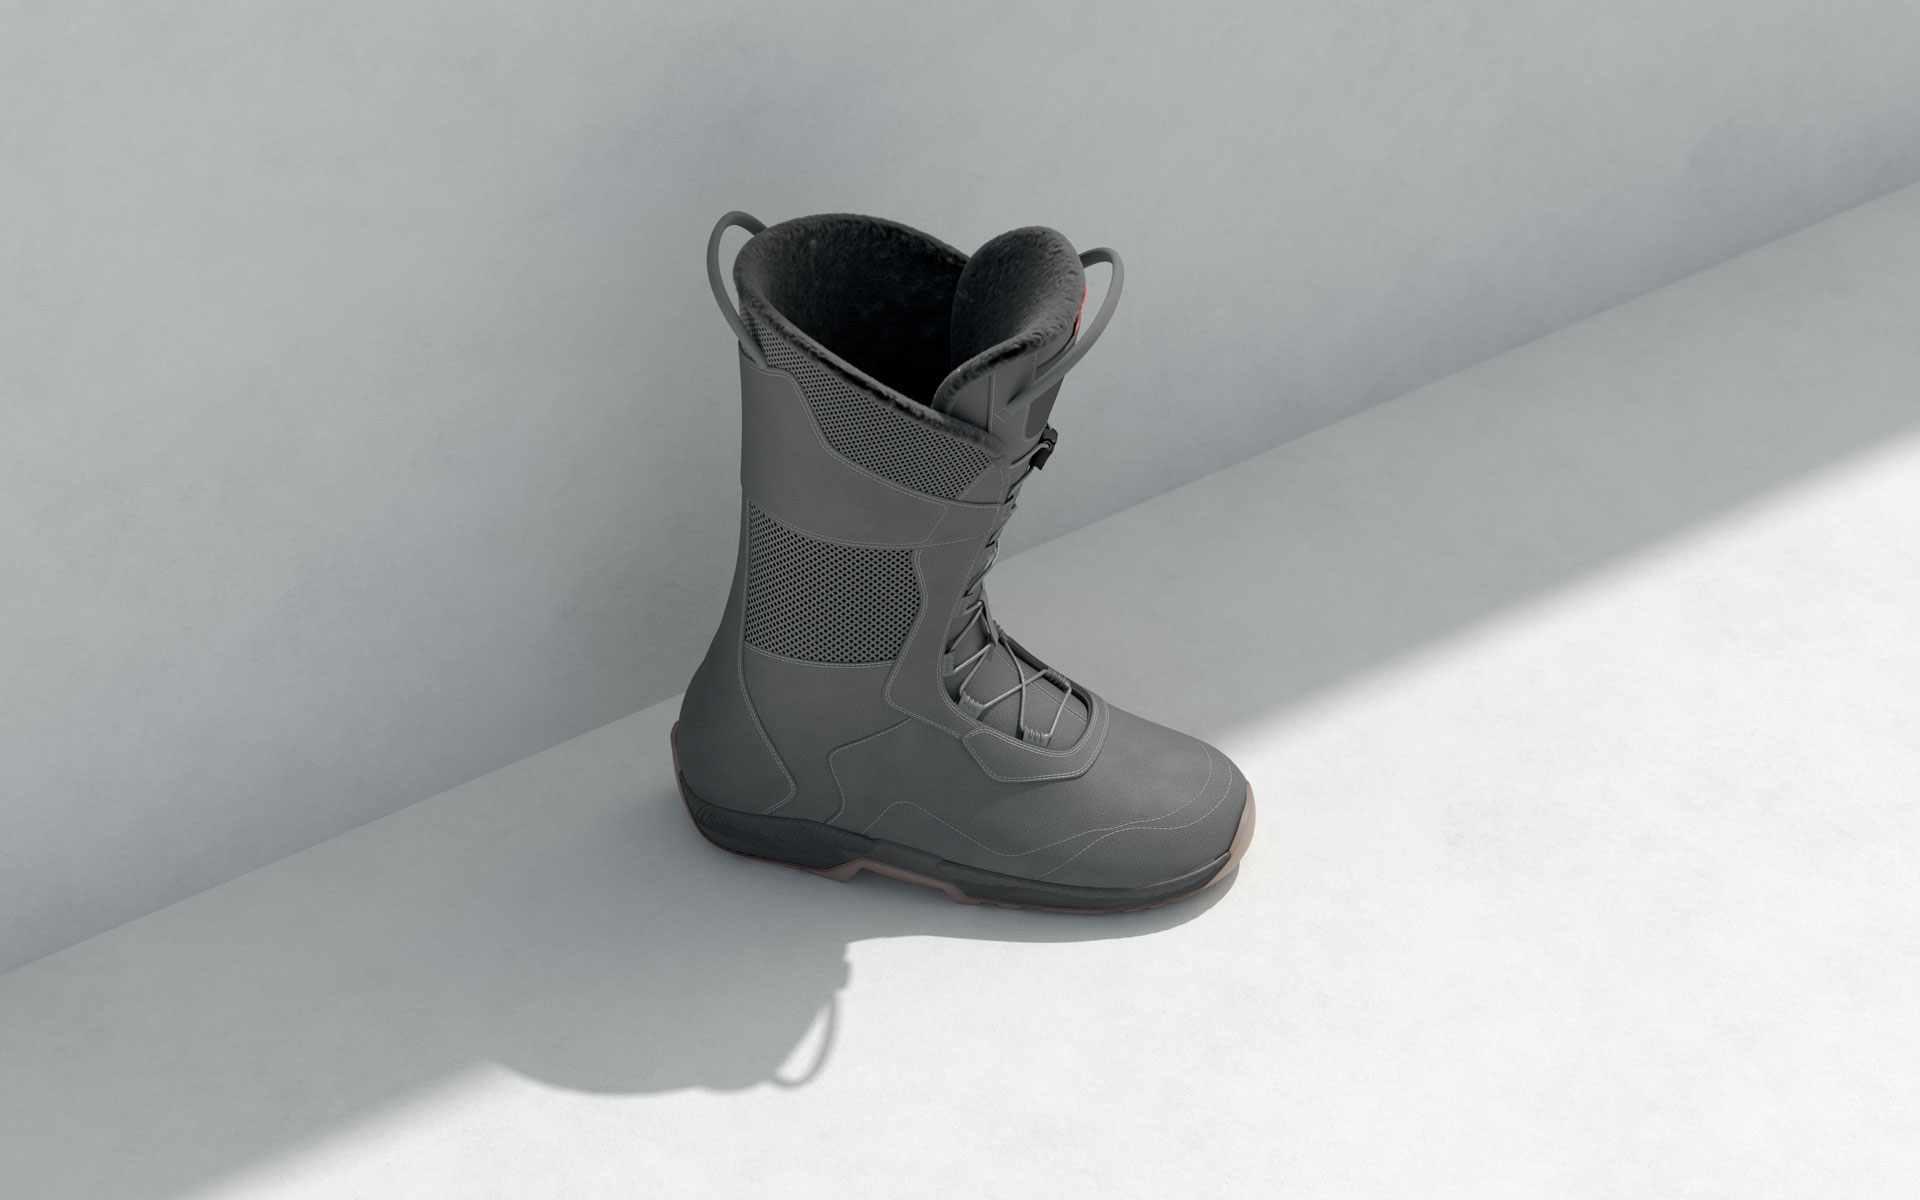 calzatura interna scarpone da sci